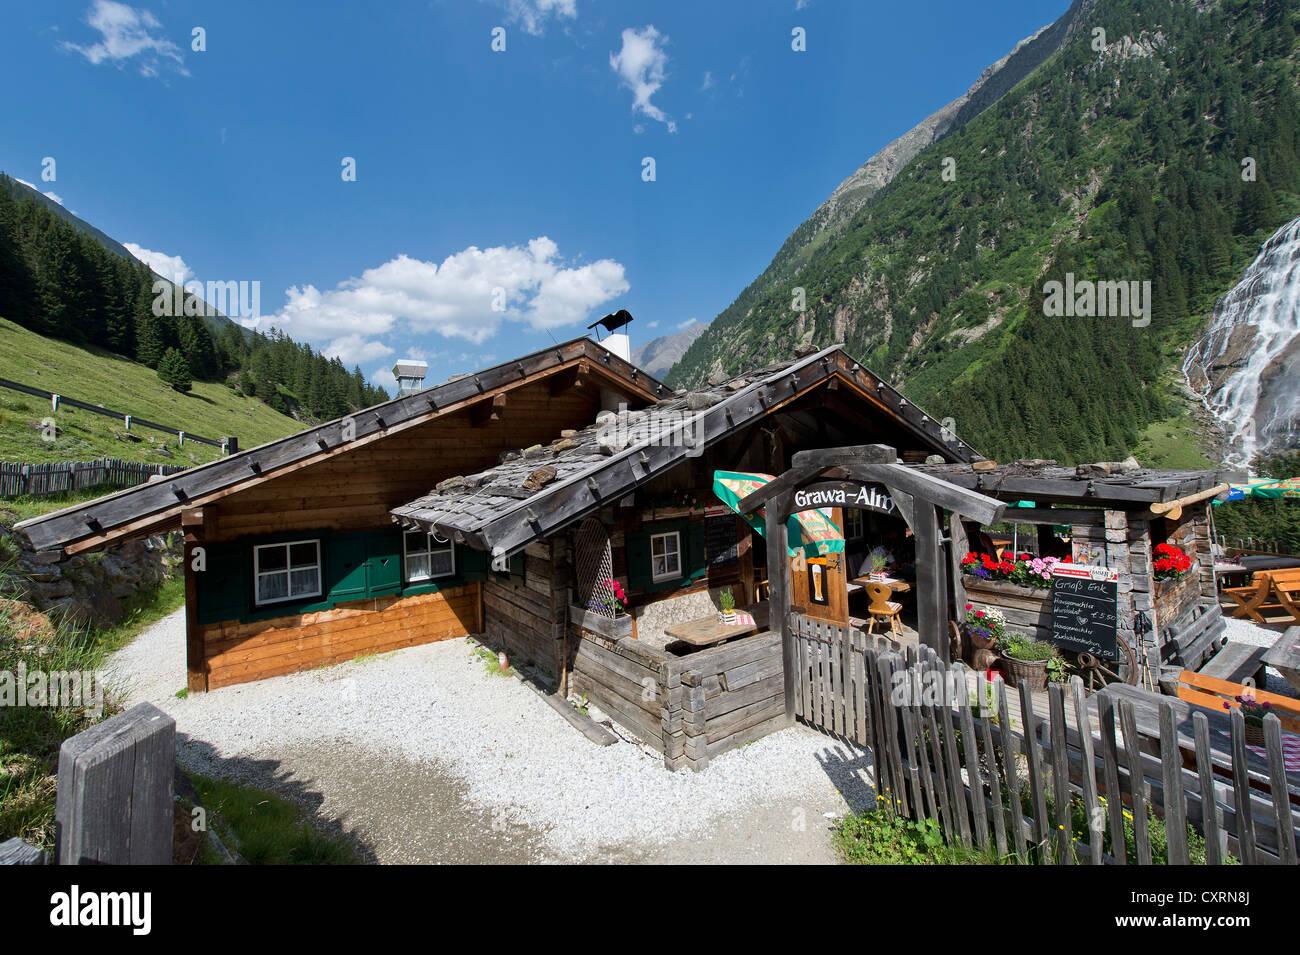 Grawa Alm alp, Stubaital valley, Tyrol, Austria, Europe - Stock Image